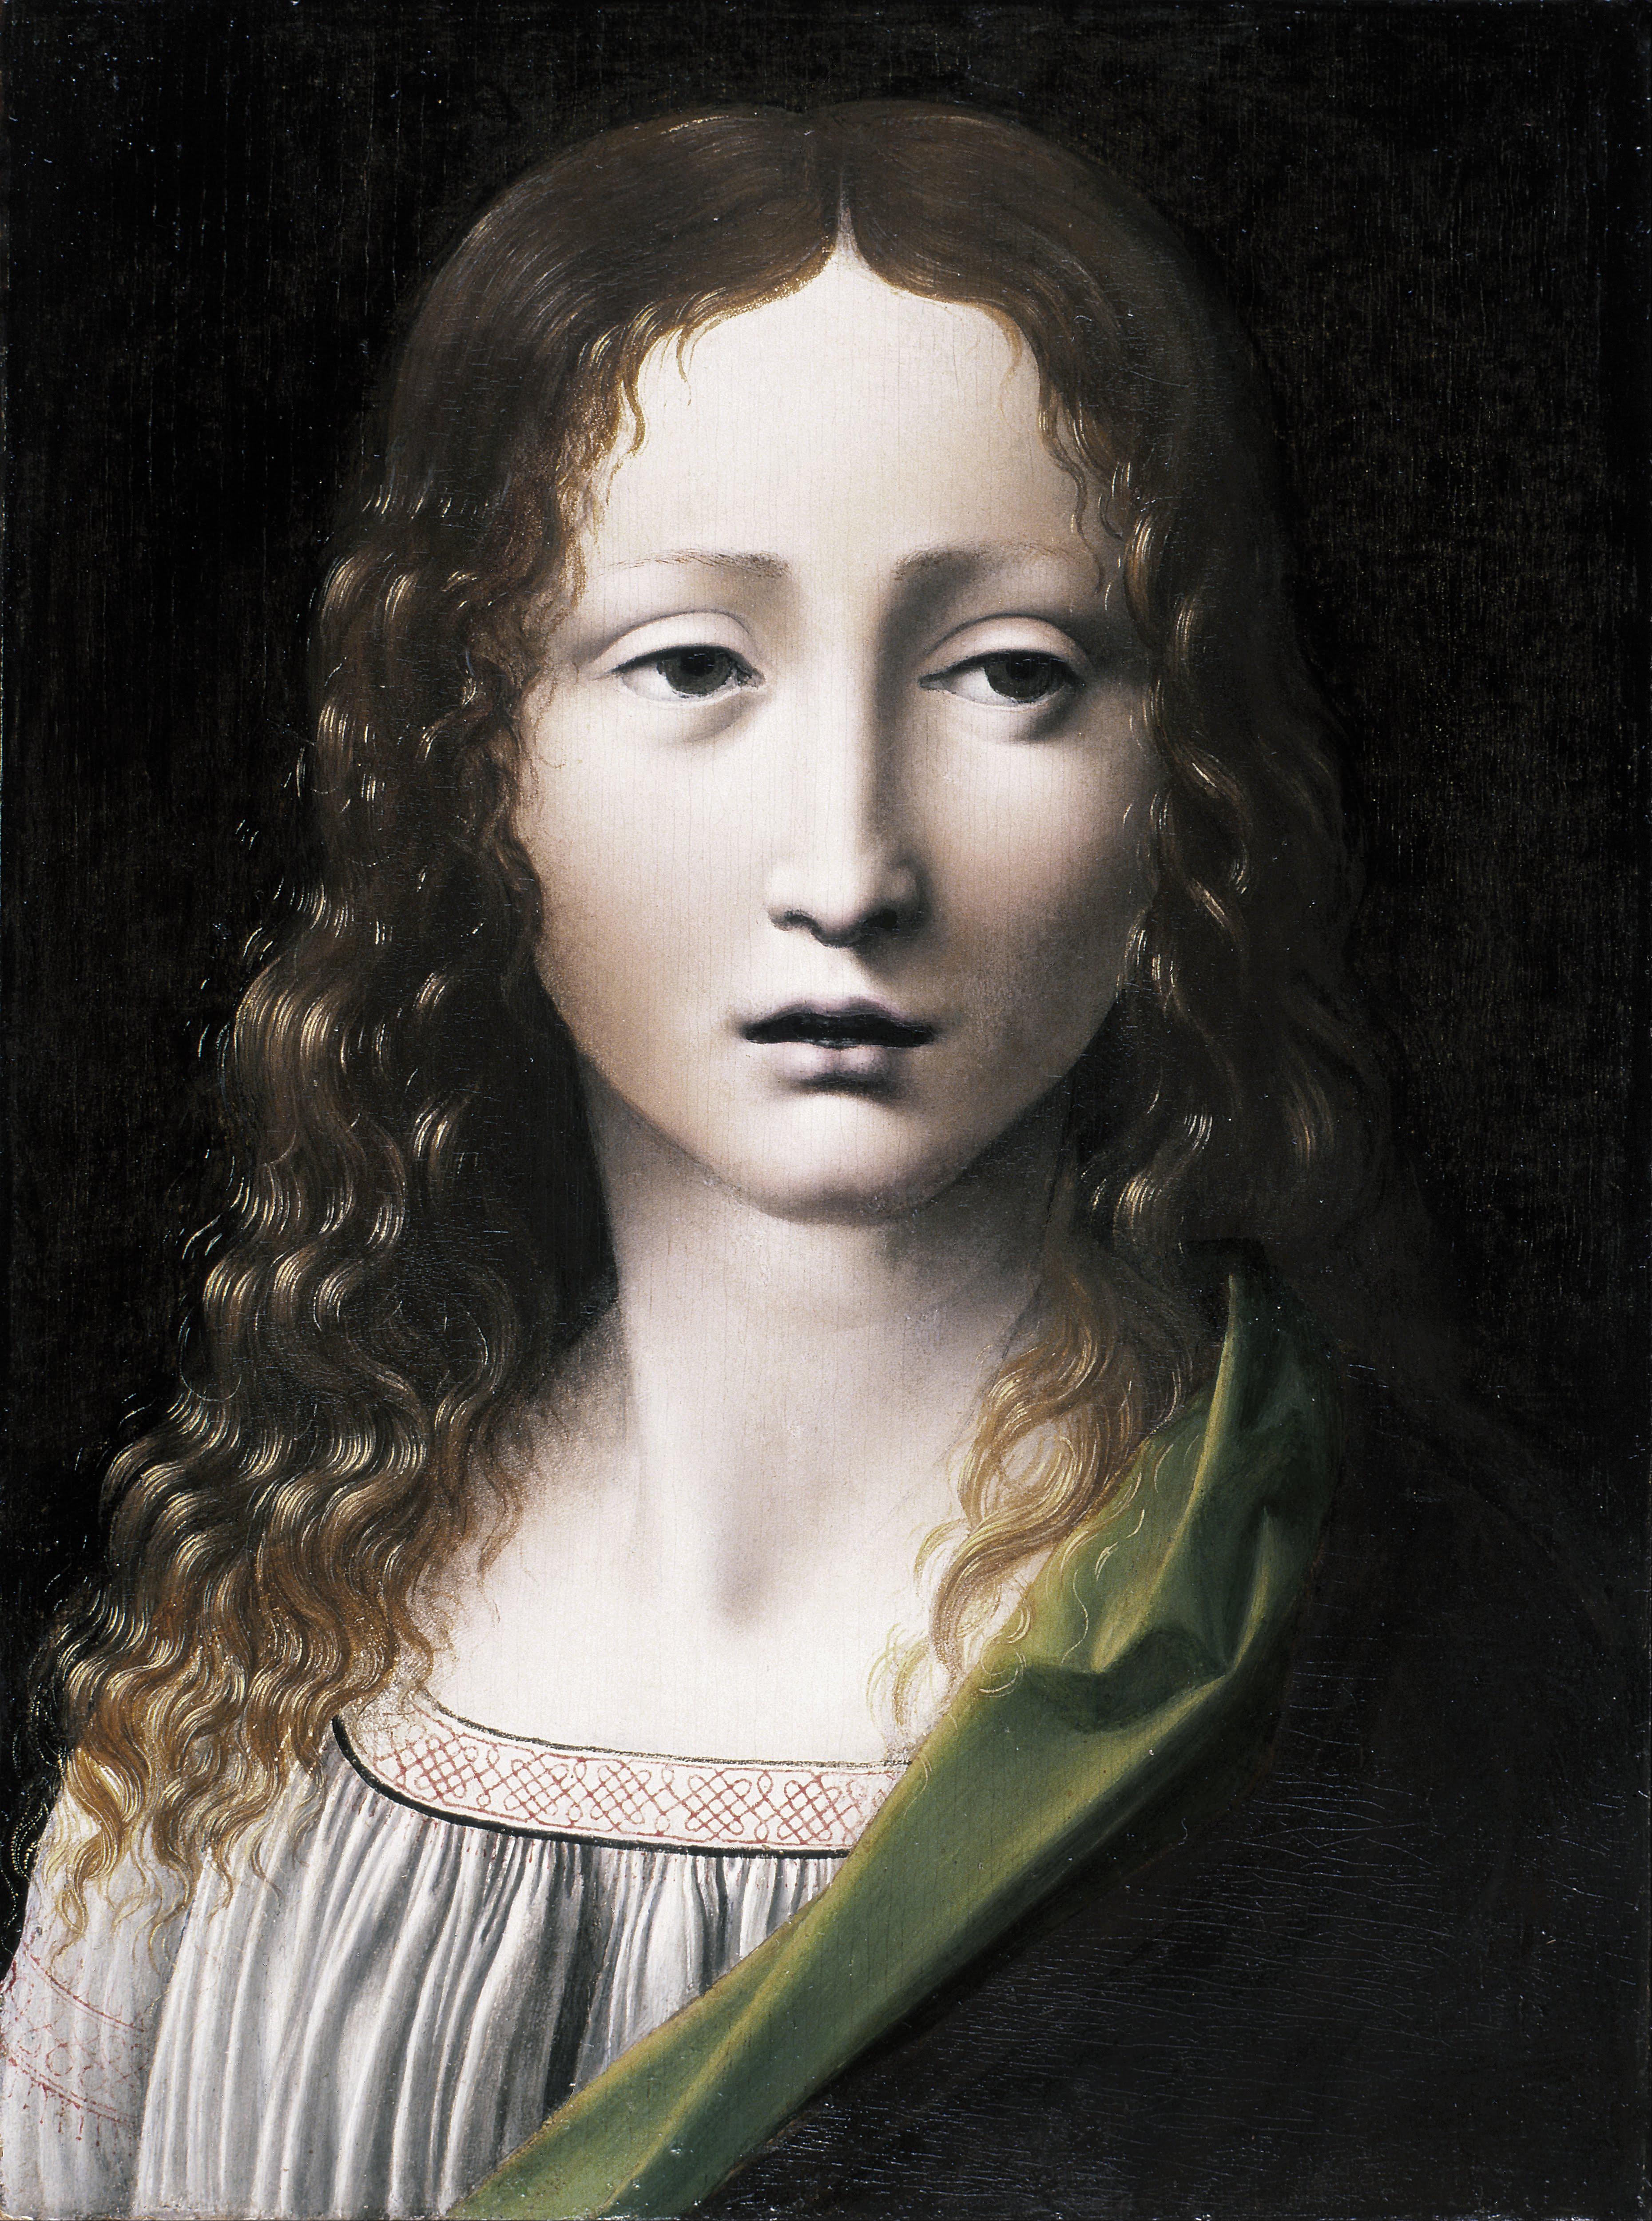 https://upload.wikimedia.org/wikipedia/commons/9/9b/Giovanni_Antonio_Boltraffio_-_The_Adolescent_Saviour_-_Google_Art_Project.jpg